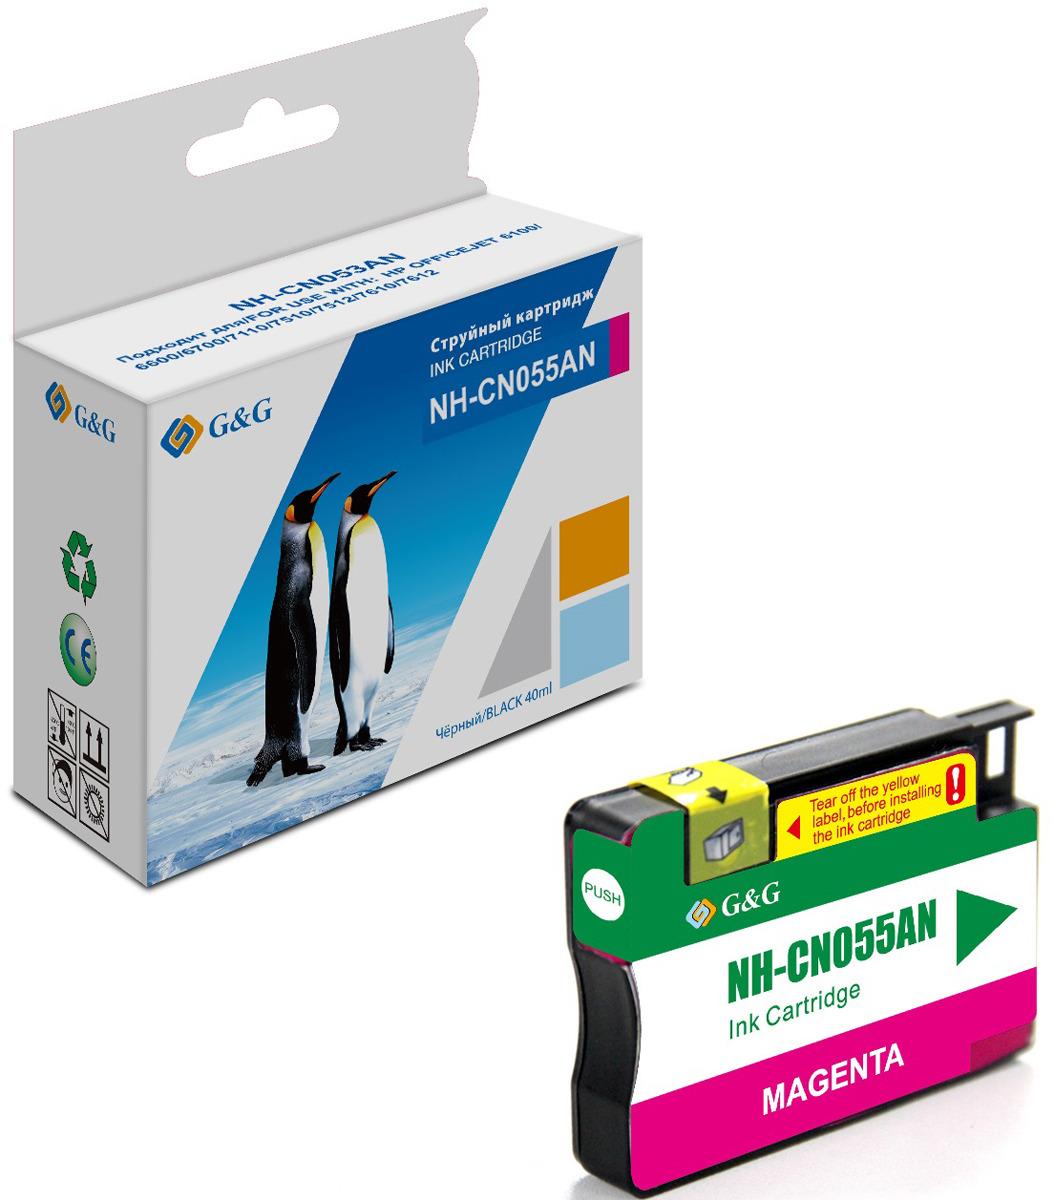 Картридж G&G NH-CN055AN 933XL для HP OJ Pro 6100-6700/7110/7510/7610/7612 (14 ml), пурпурный printer 7110 hp